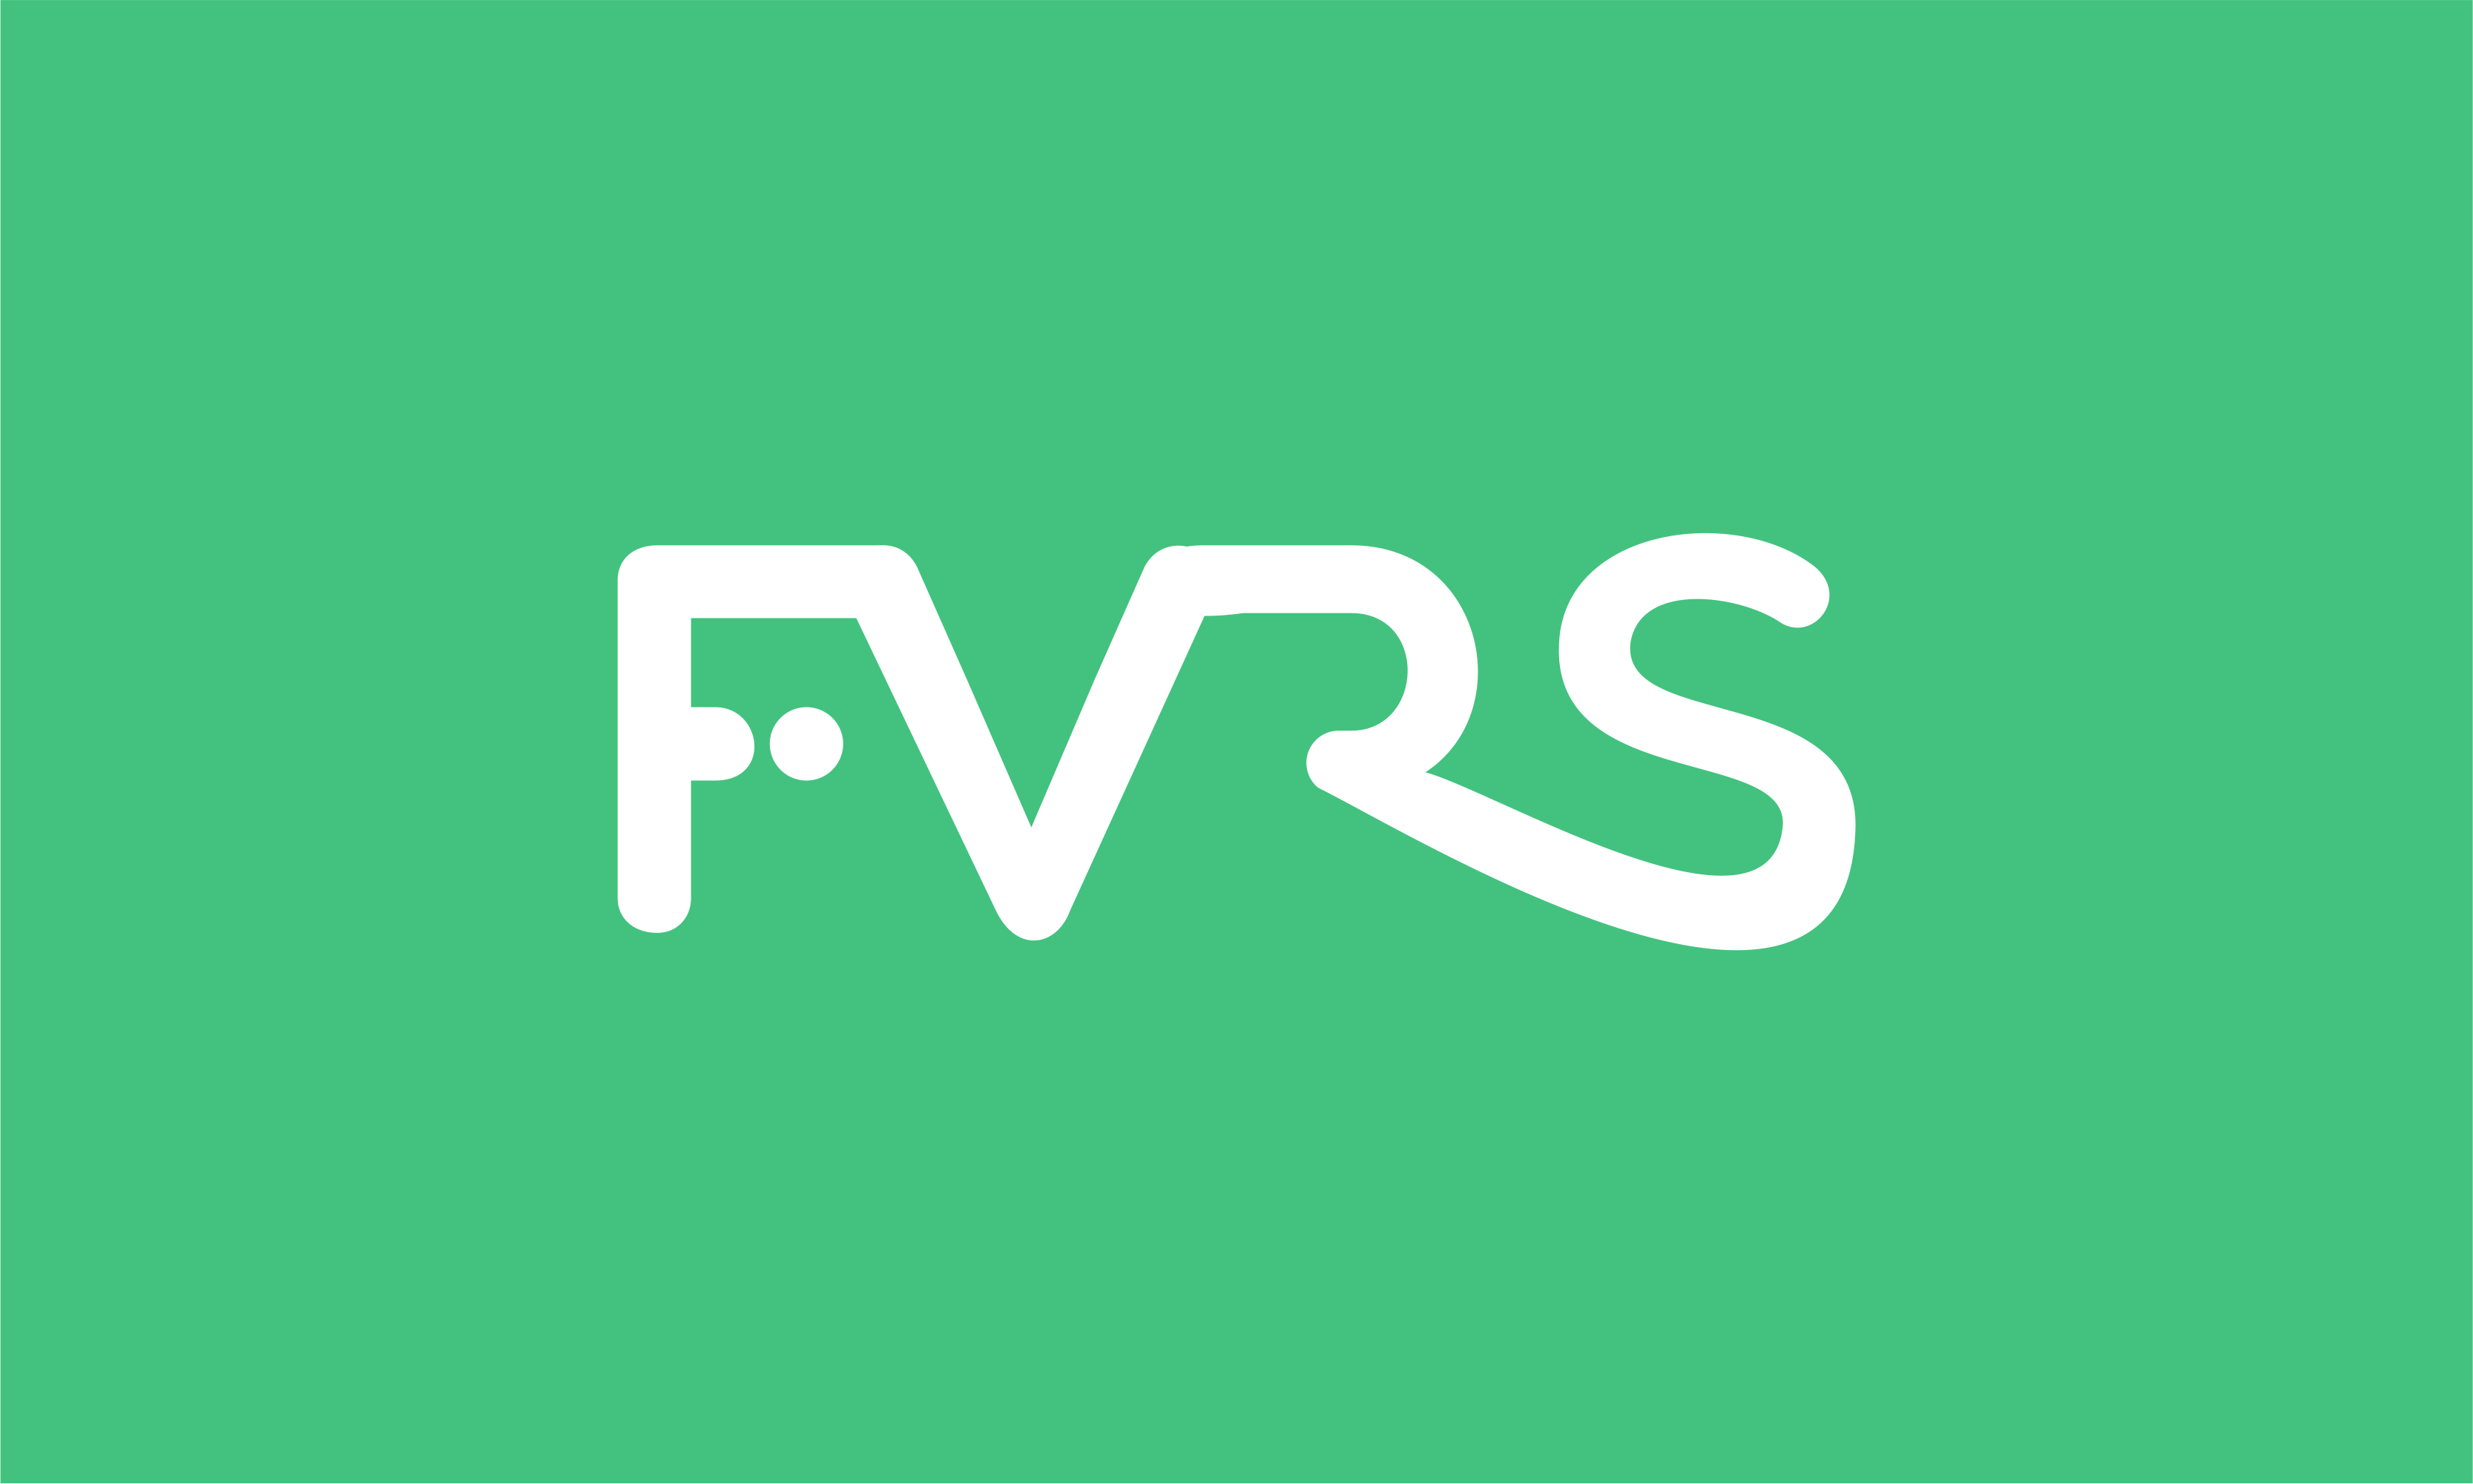 fvrs logo